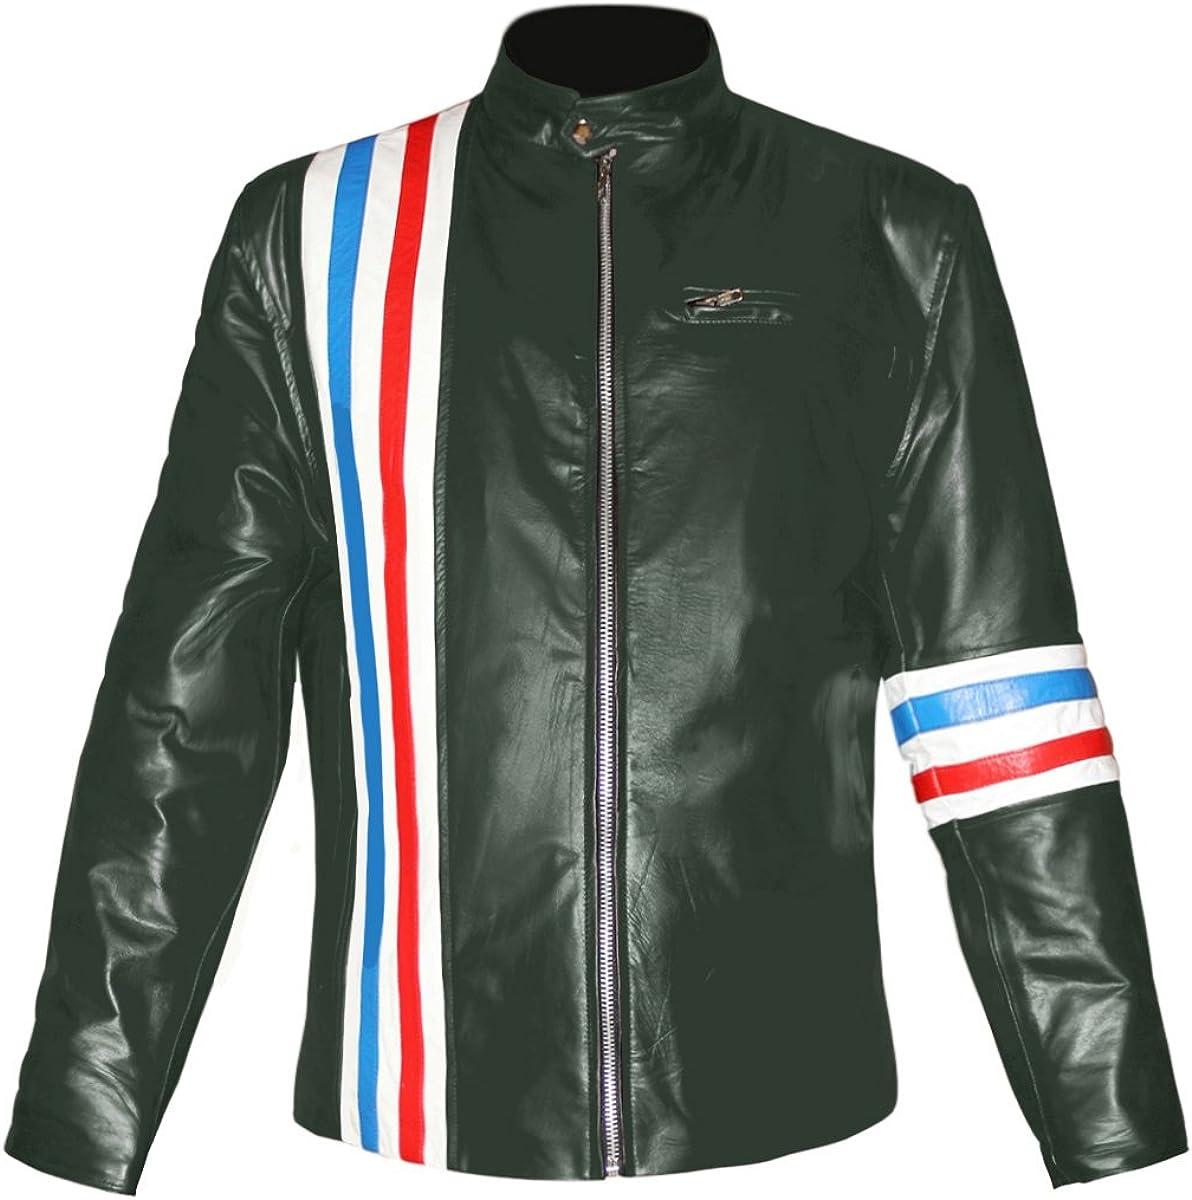 Peter Fonda Genuine Leather Easy Rider Stylish Bomber Biker Jacket with US Flag